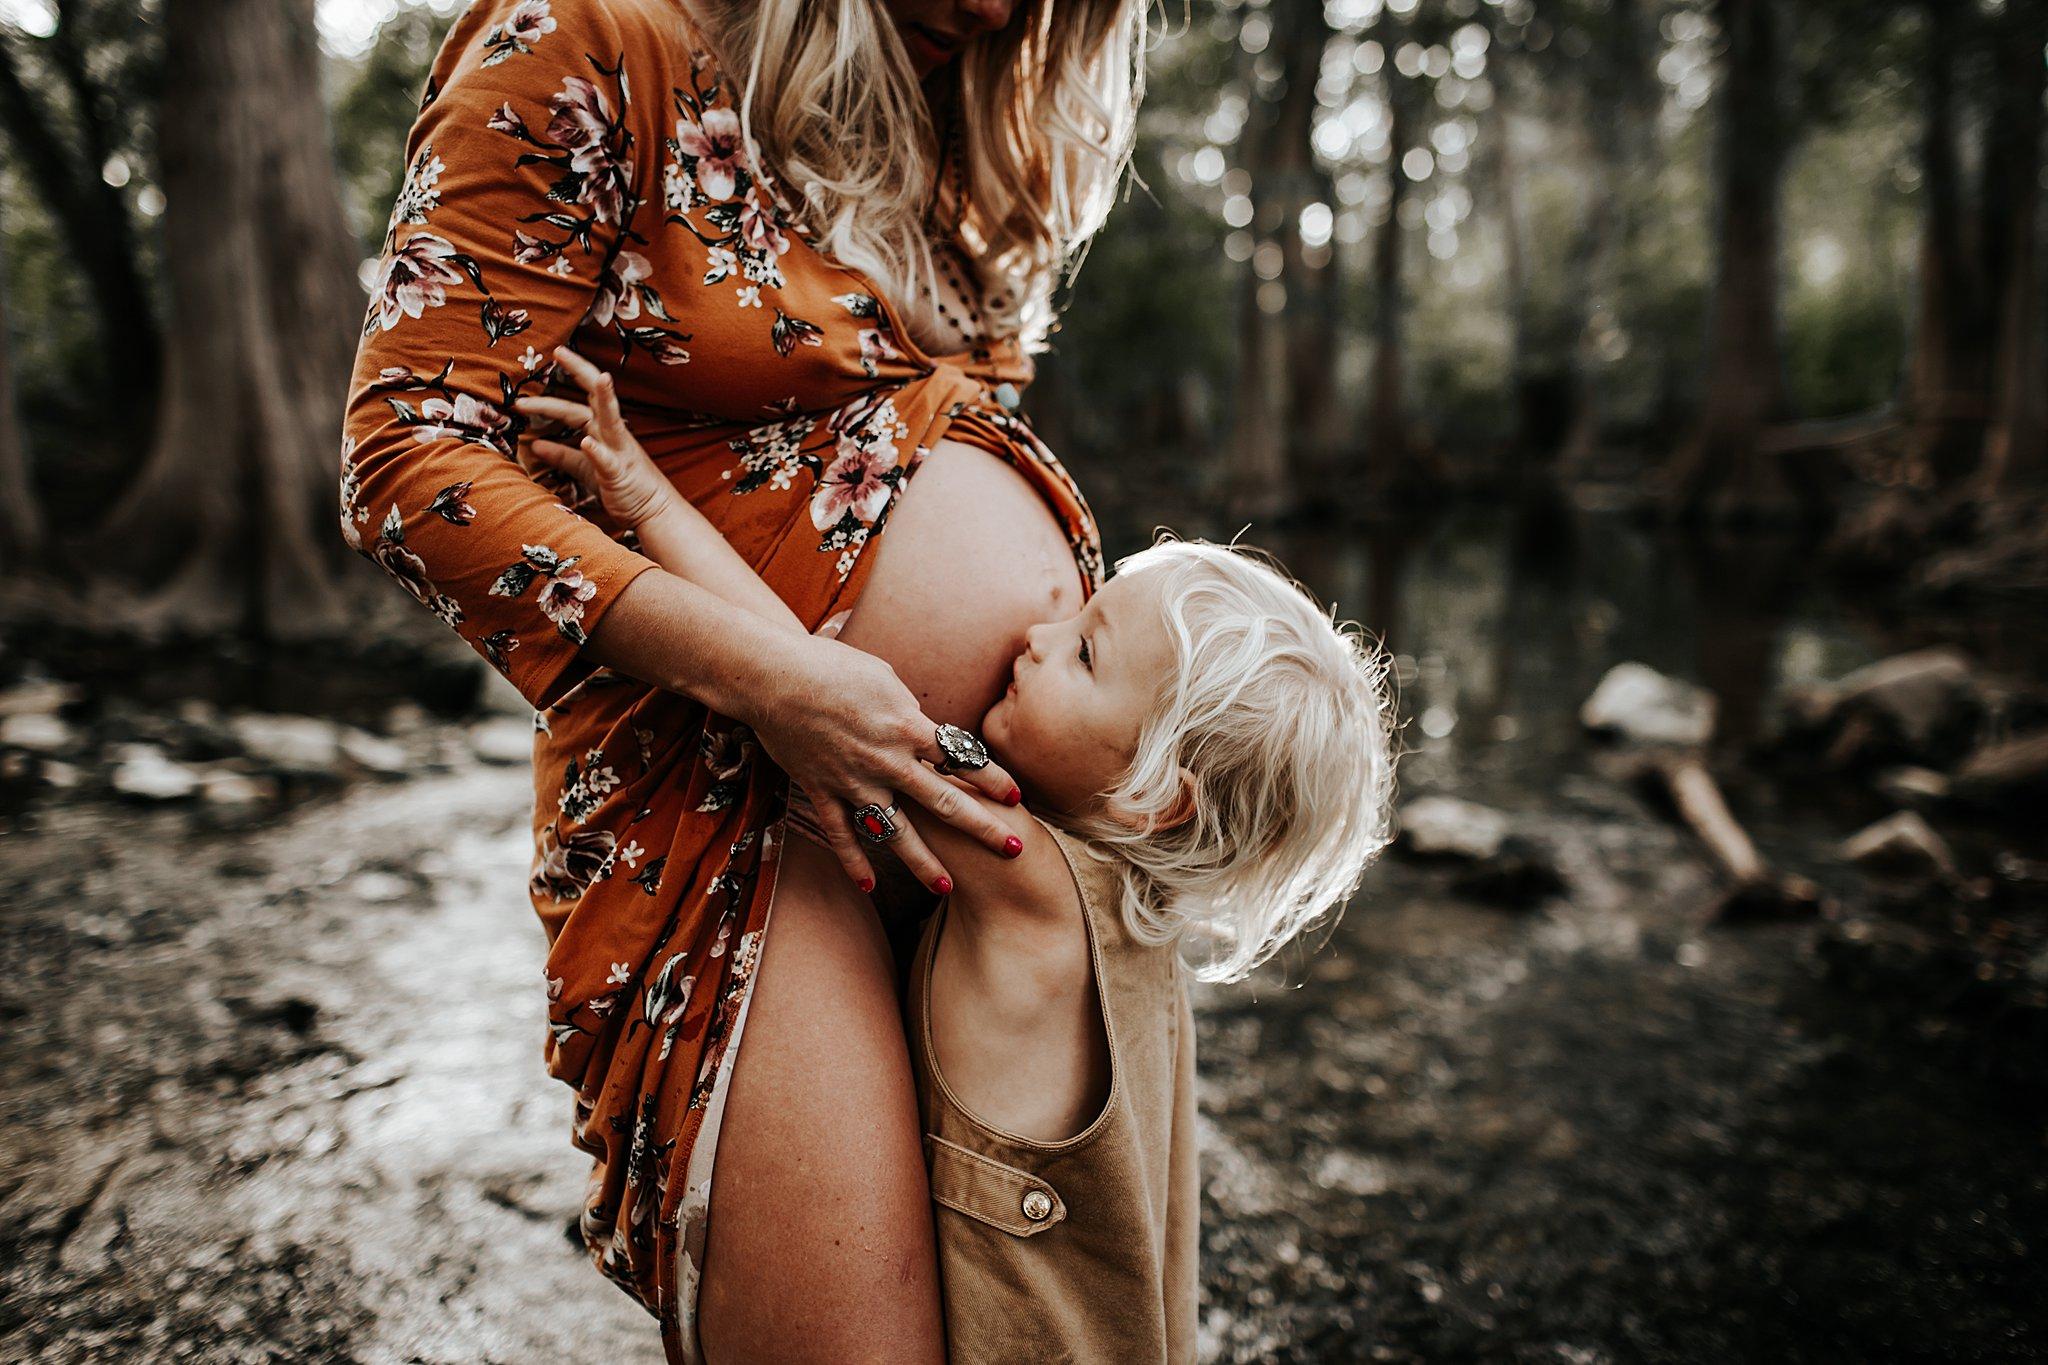 Shannon-San-Antonio-Maternity-Photographer-16_WEB.jpg